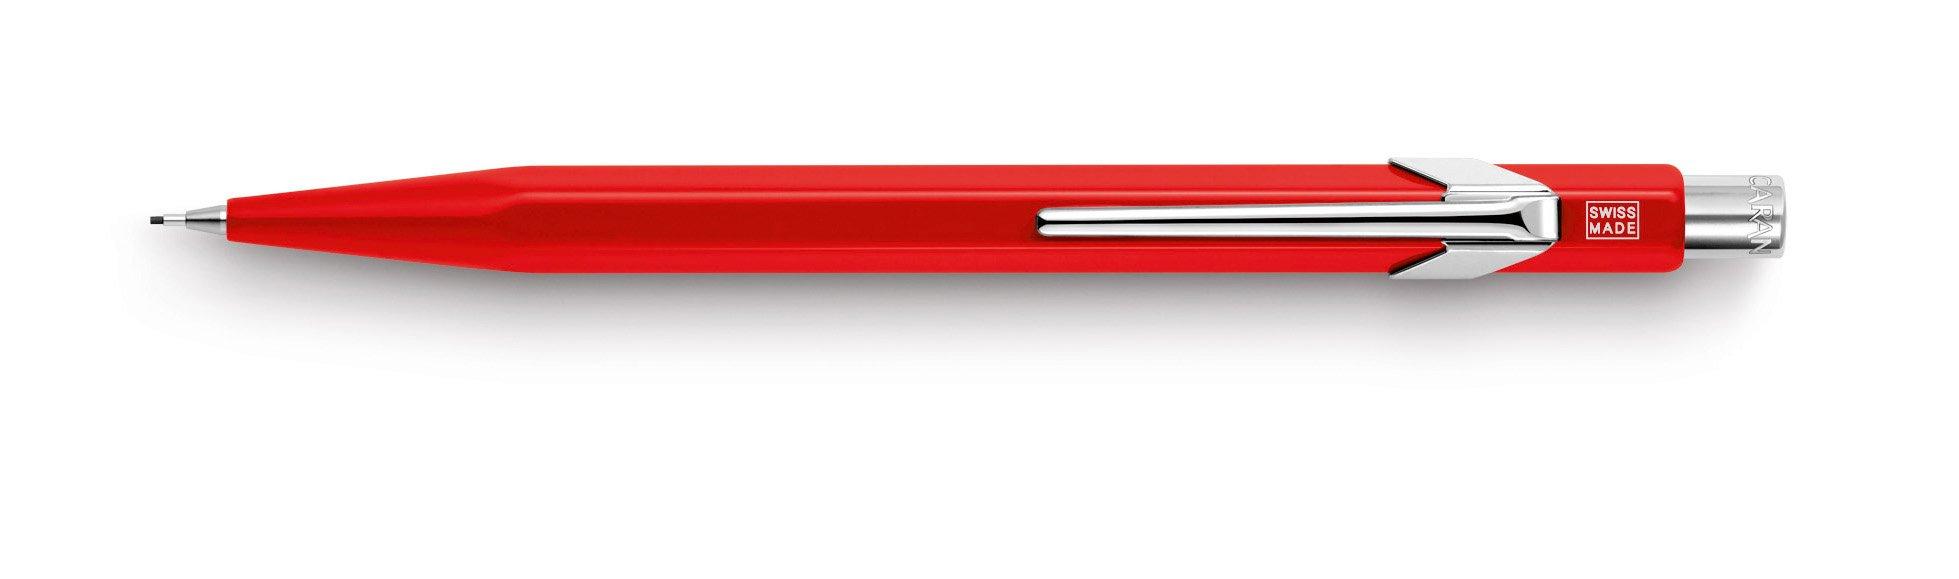 Caran Dache Creative Art Materials Metal 0.7 Portaminas Red